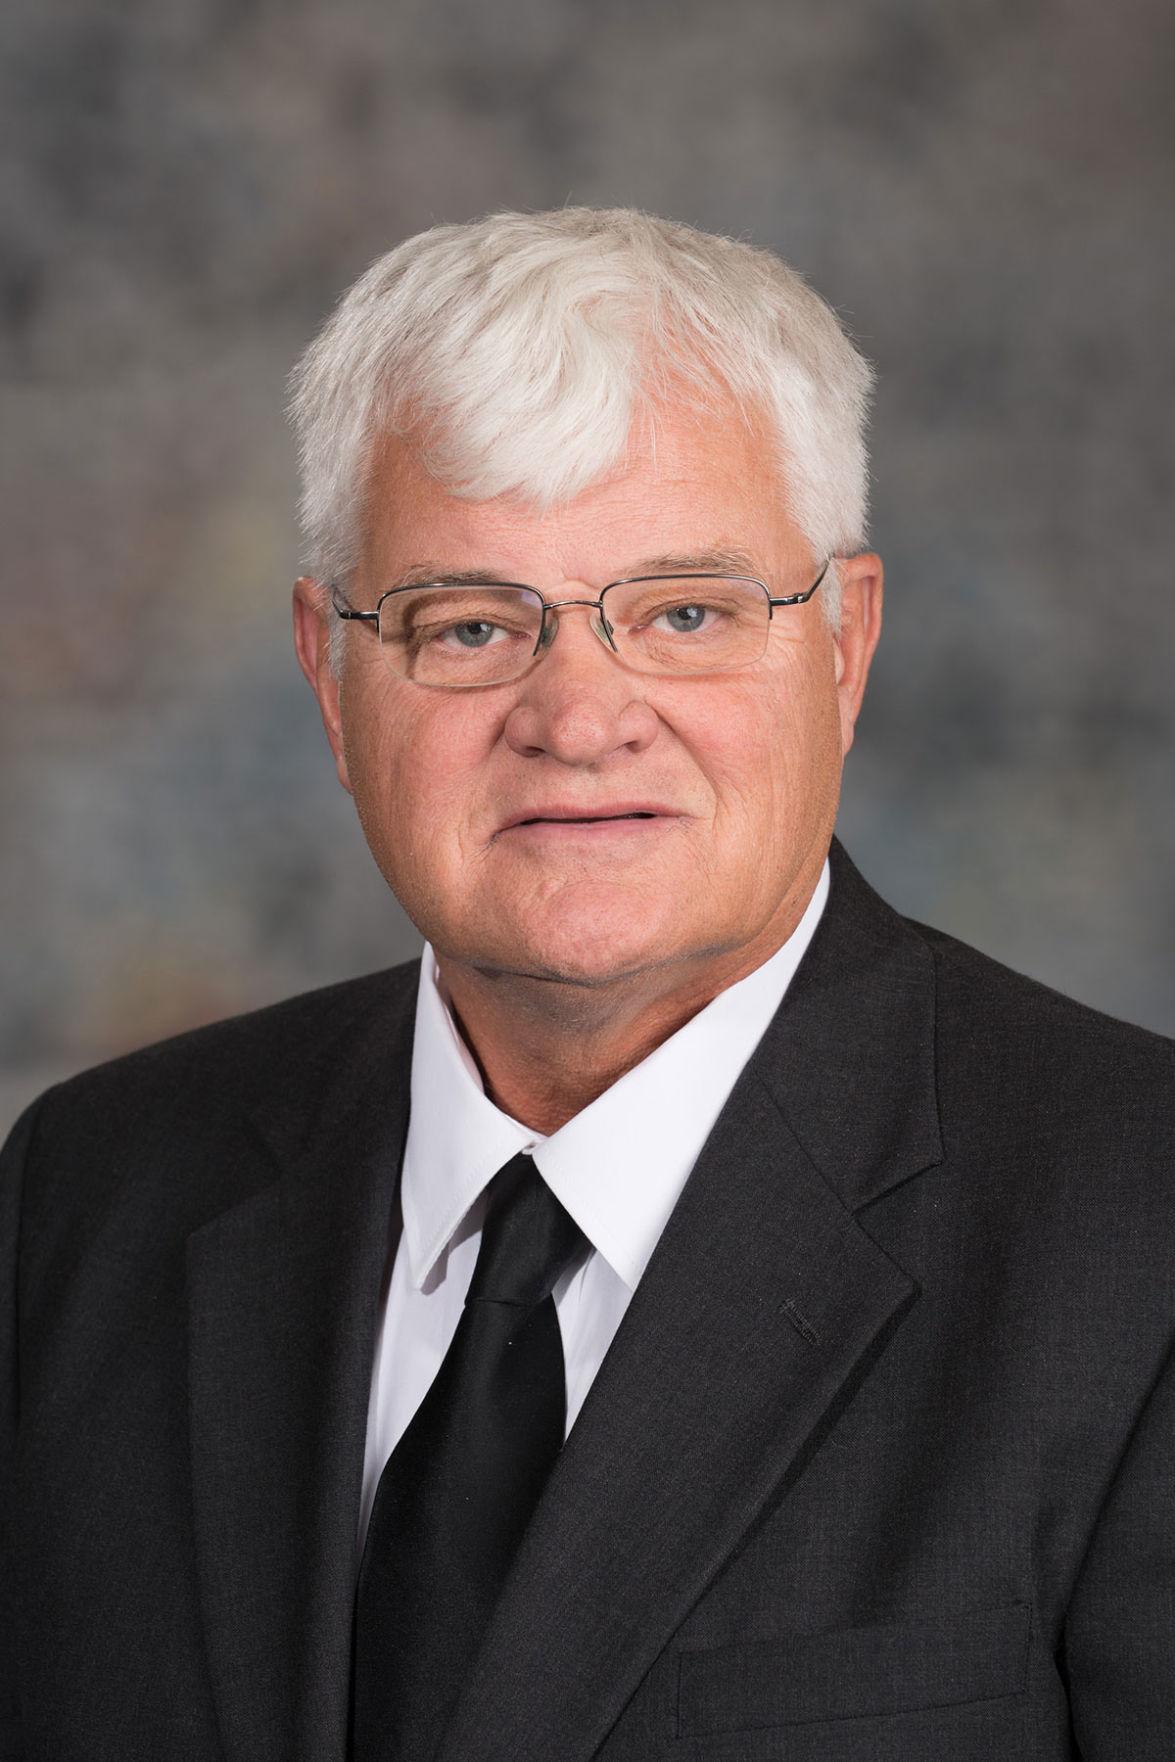 Mike Groene, Nebraska Legislature